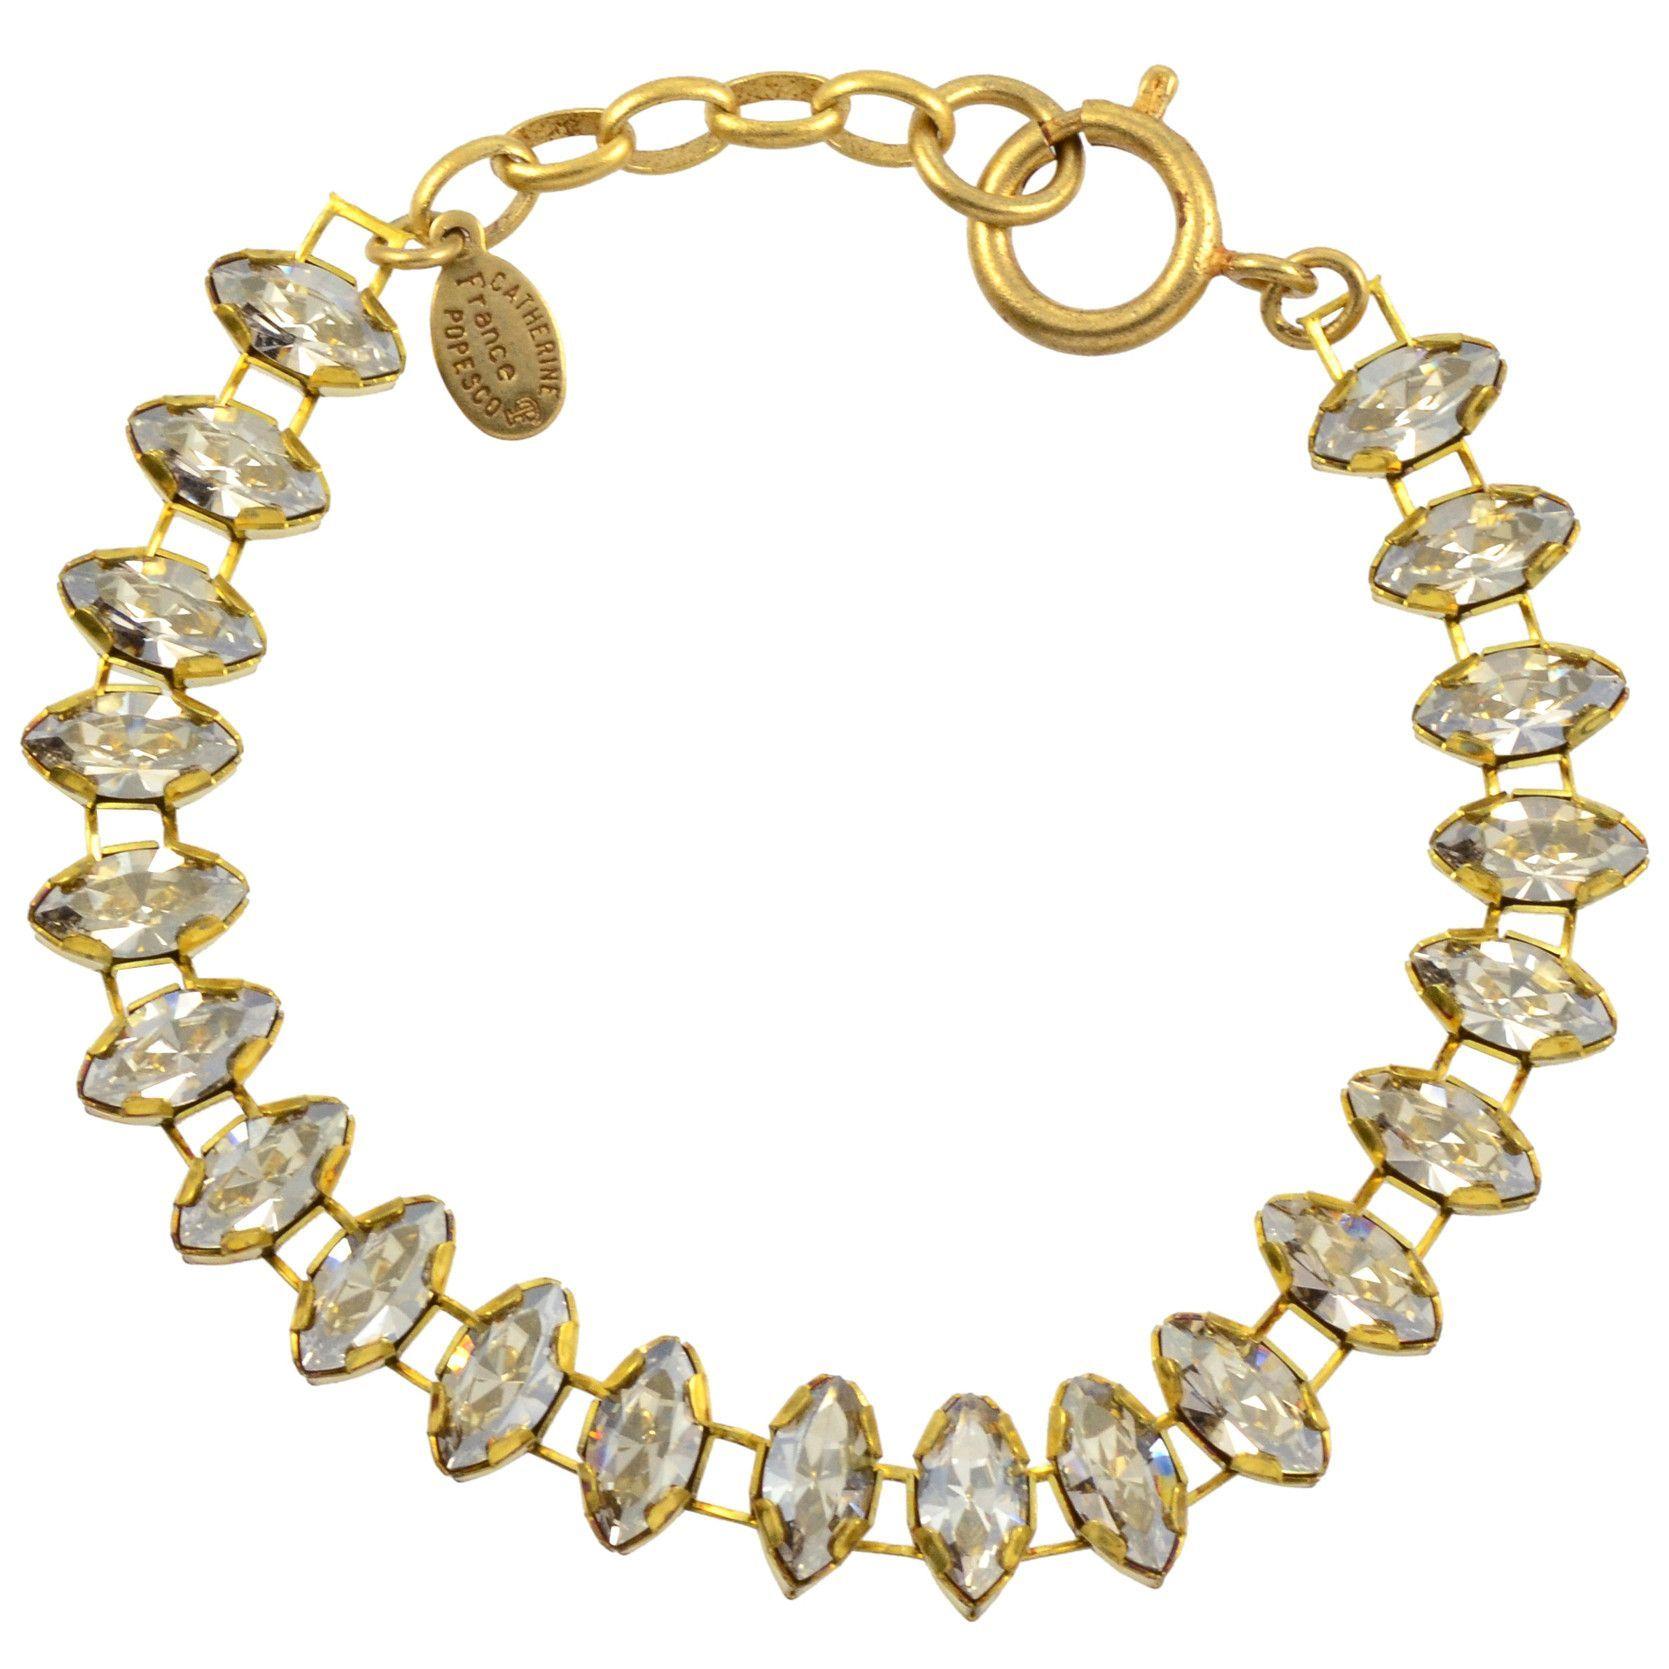 "Catherine Popesco Eye Shaped Tennis Bracelet, La Vie Parisienne Gold Plated with Grey Swarovski Crystal, 8"" 1637G SILS"